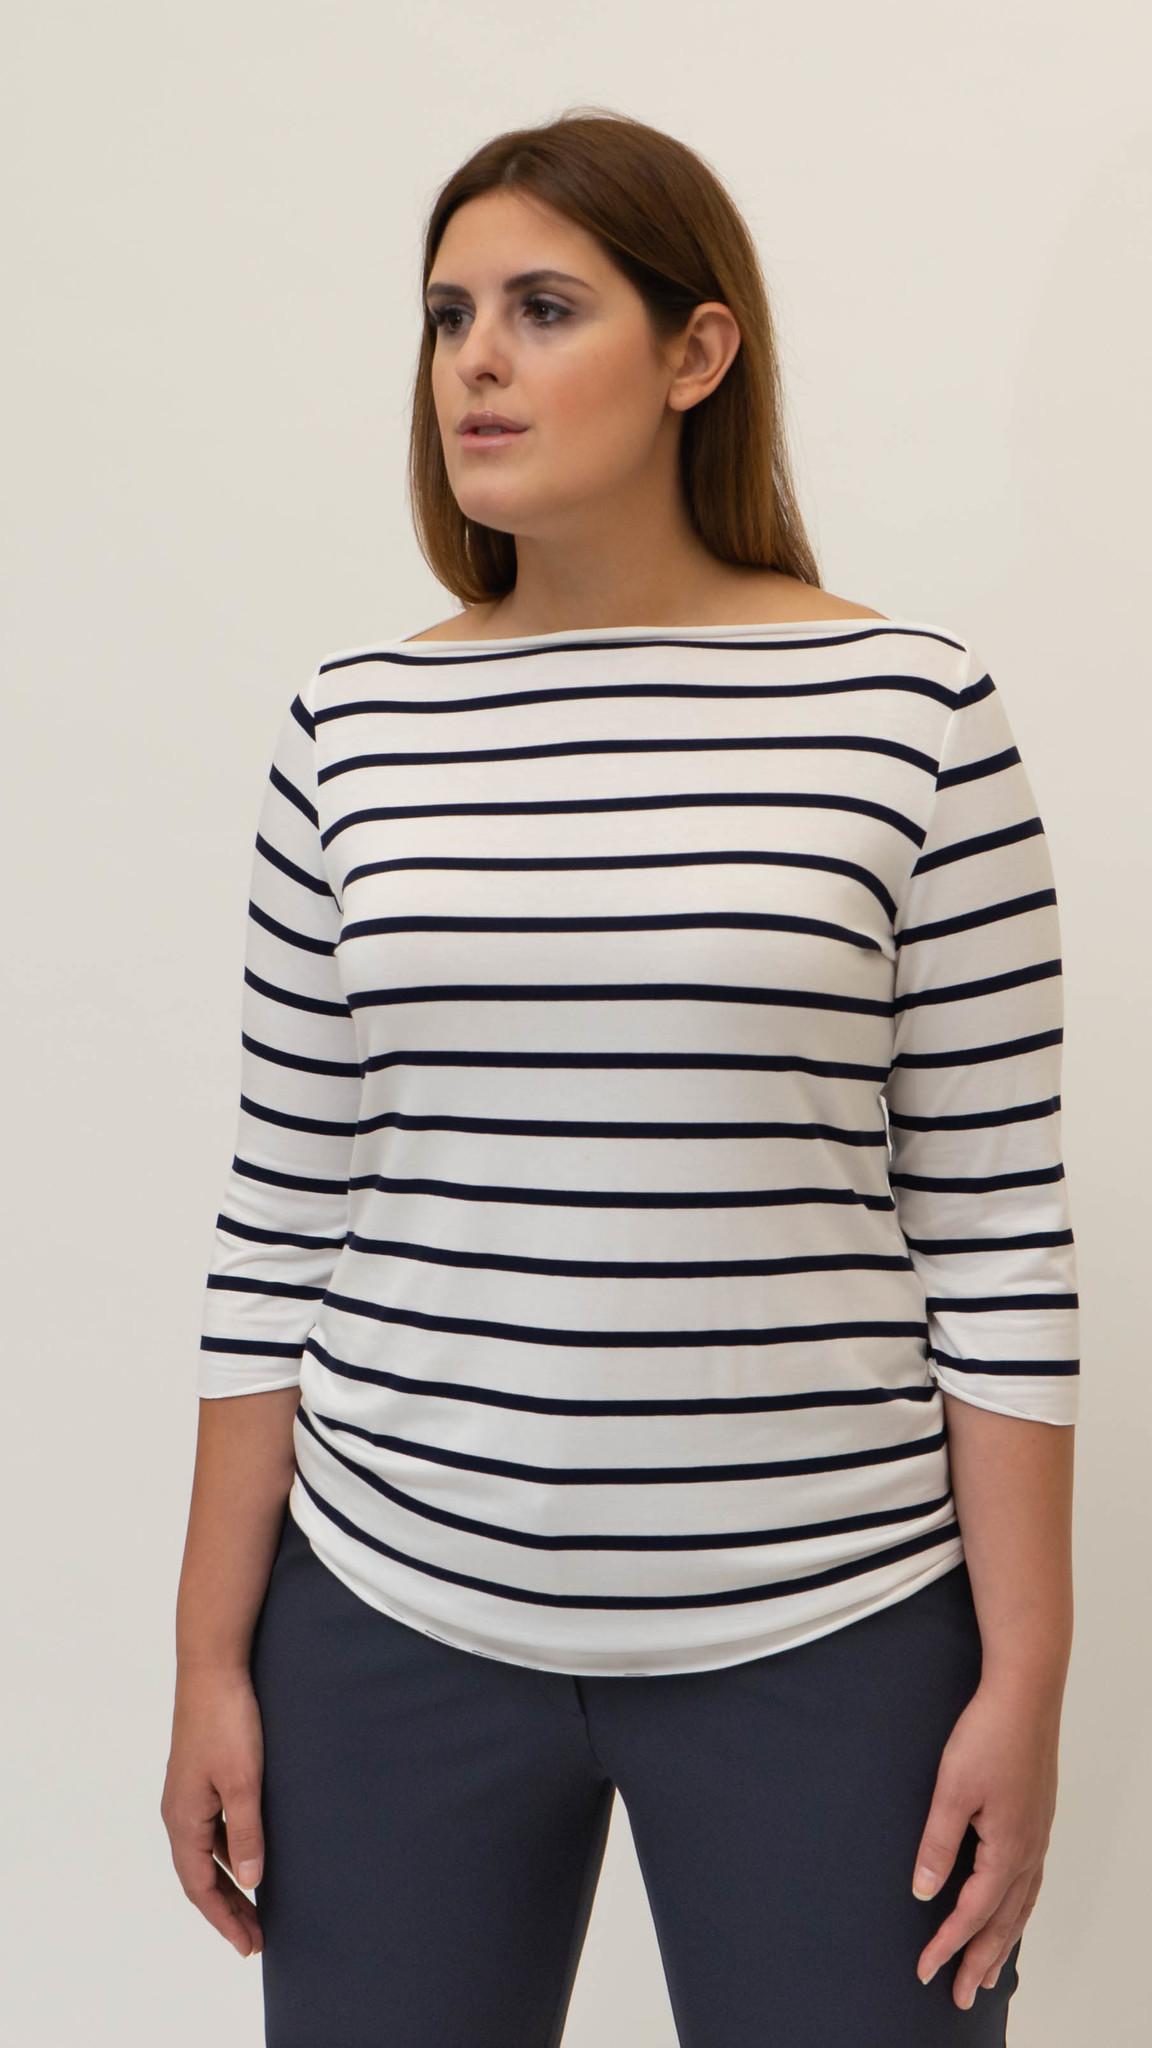 MARIETTE Shirt in Jersey-2